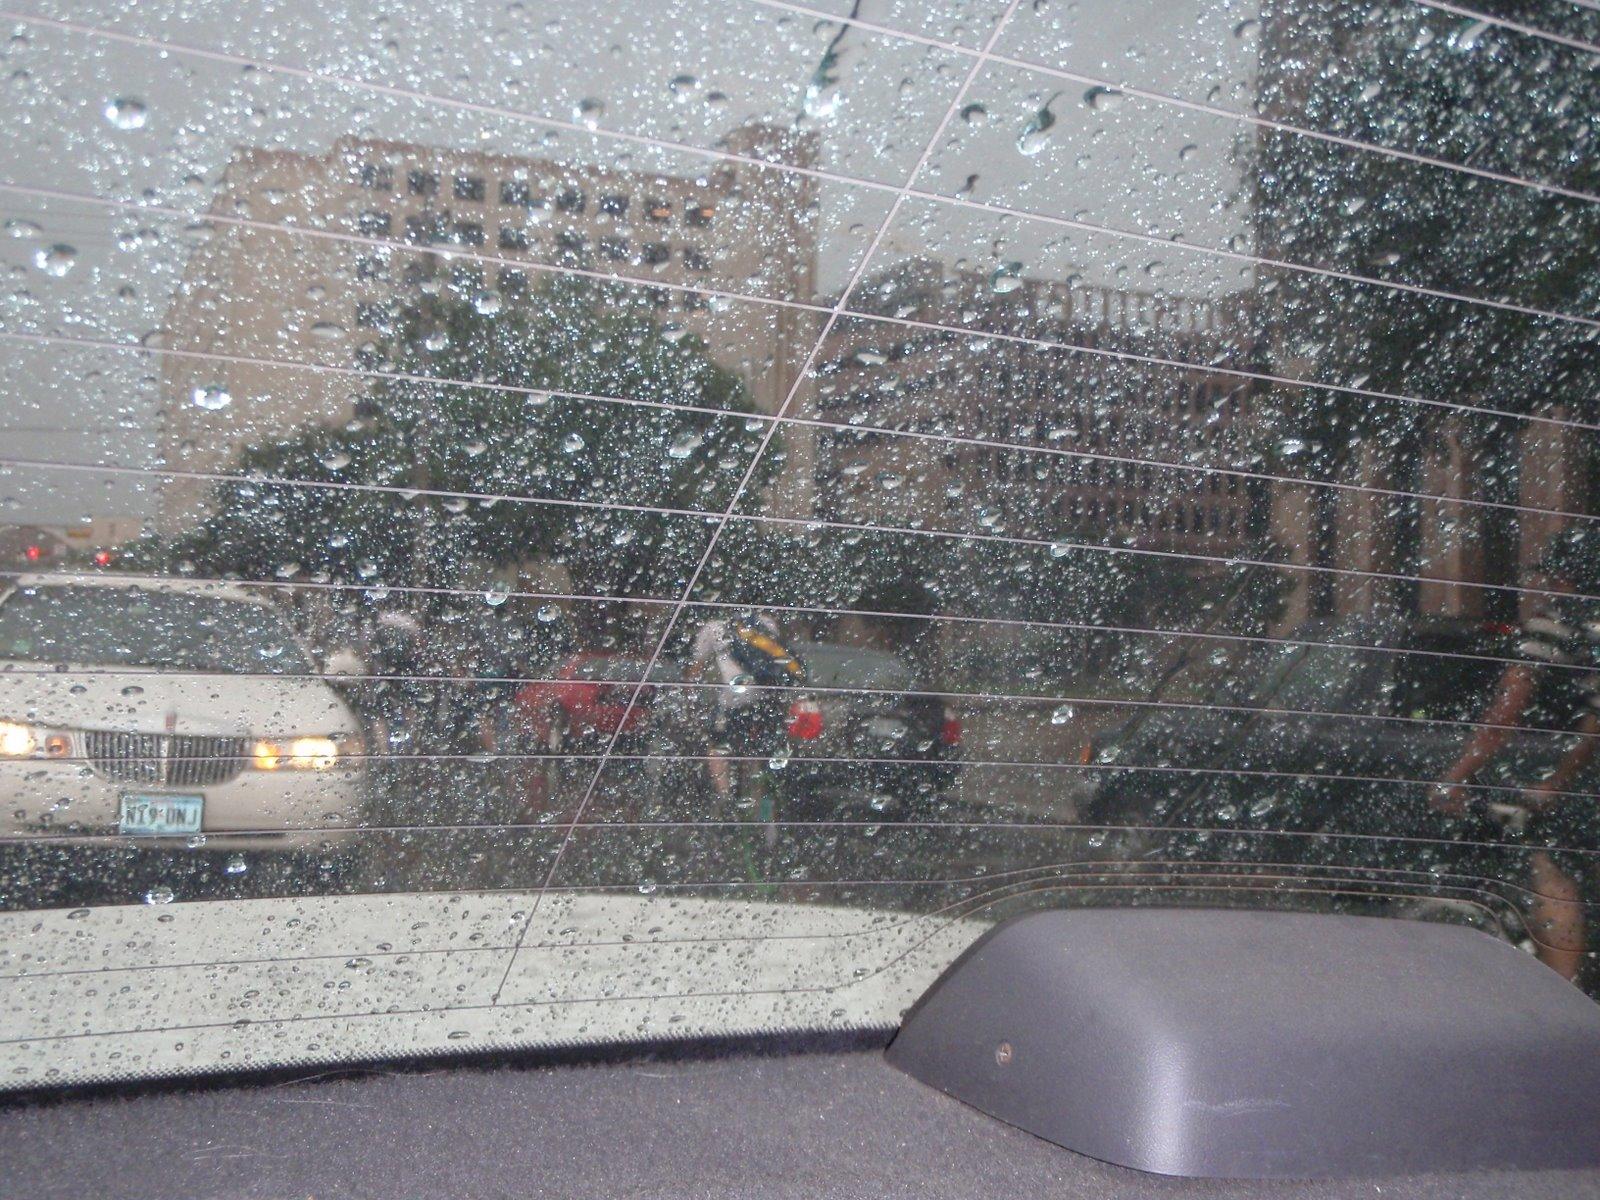 [austin+fixies+in+rain.jpg]